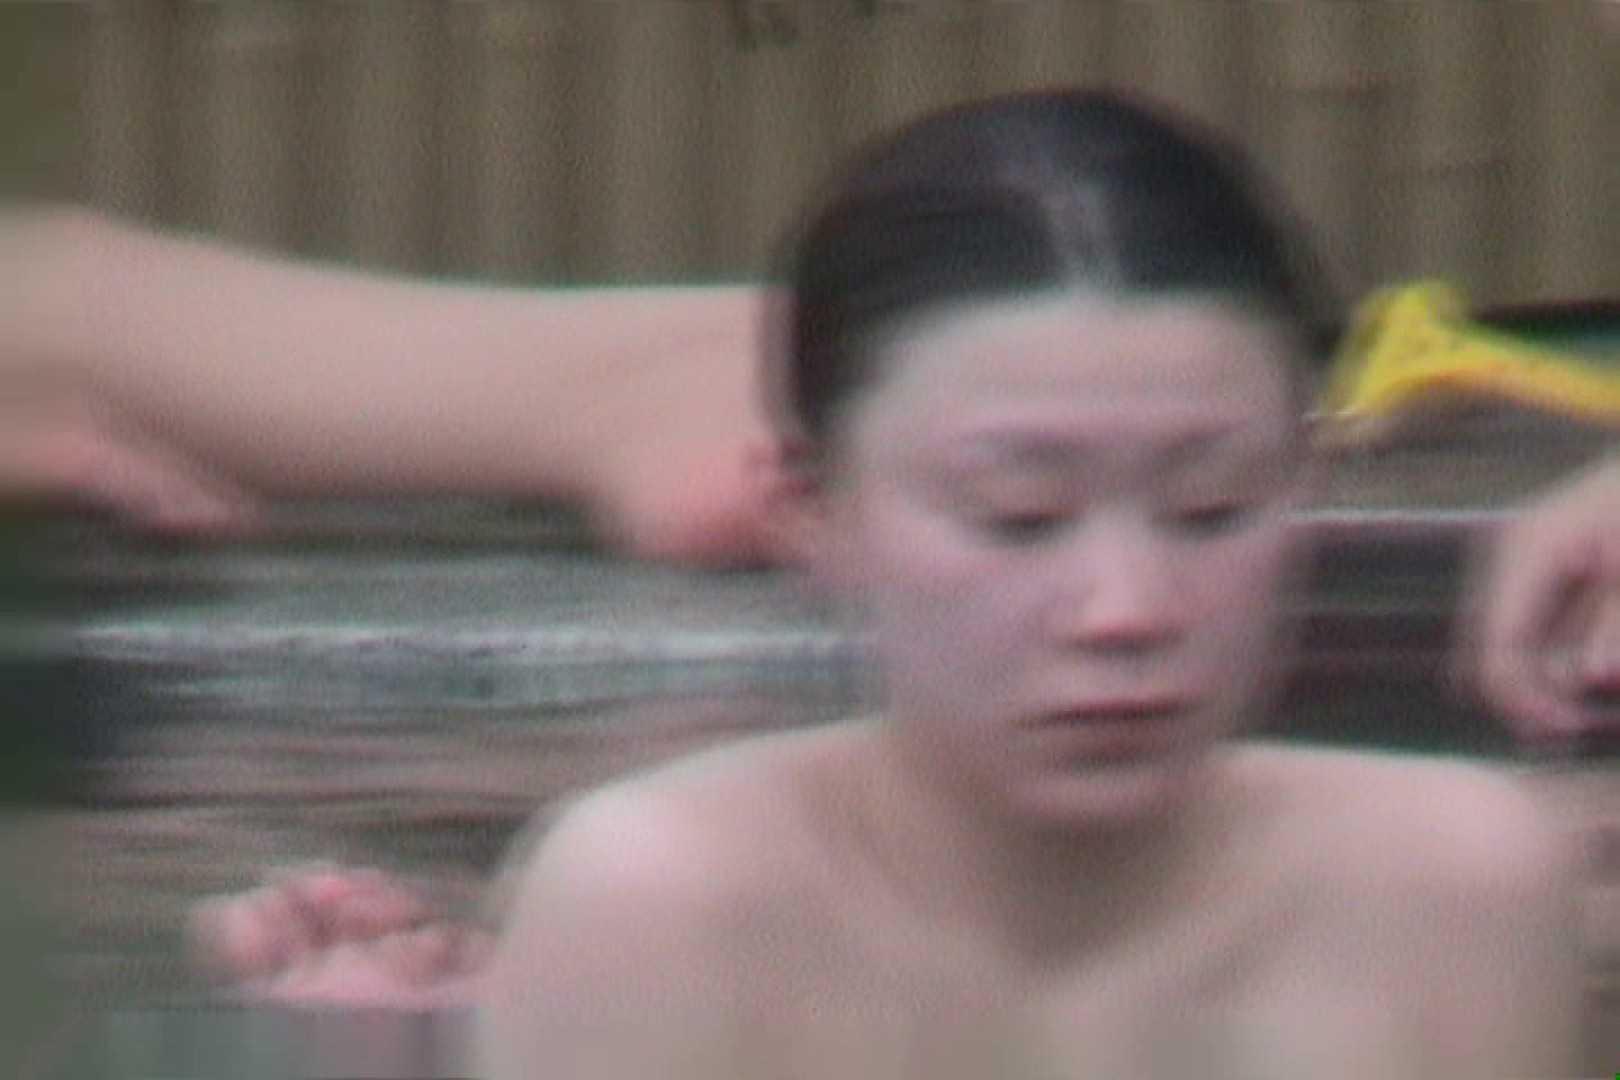 Aquaな露天風呂Vol.599 盗撮 われめAV動画紹介 71枚 62